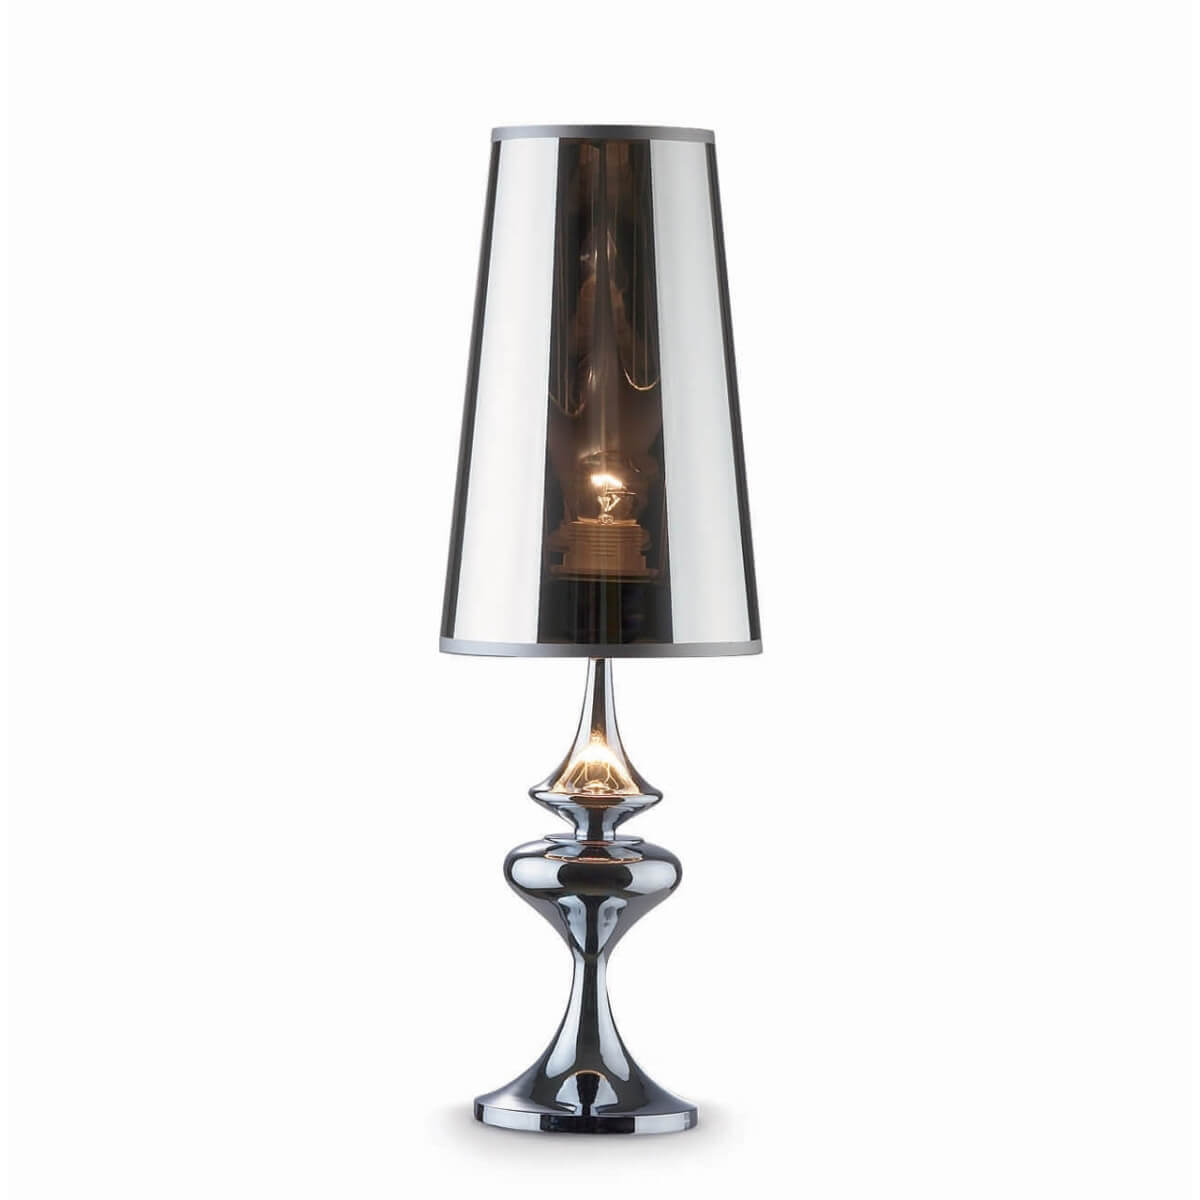 Настольная лампа Ideal Lux AlfIere TL1 Small недорого